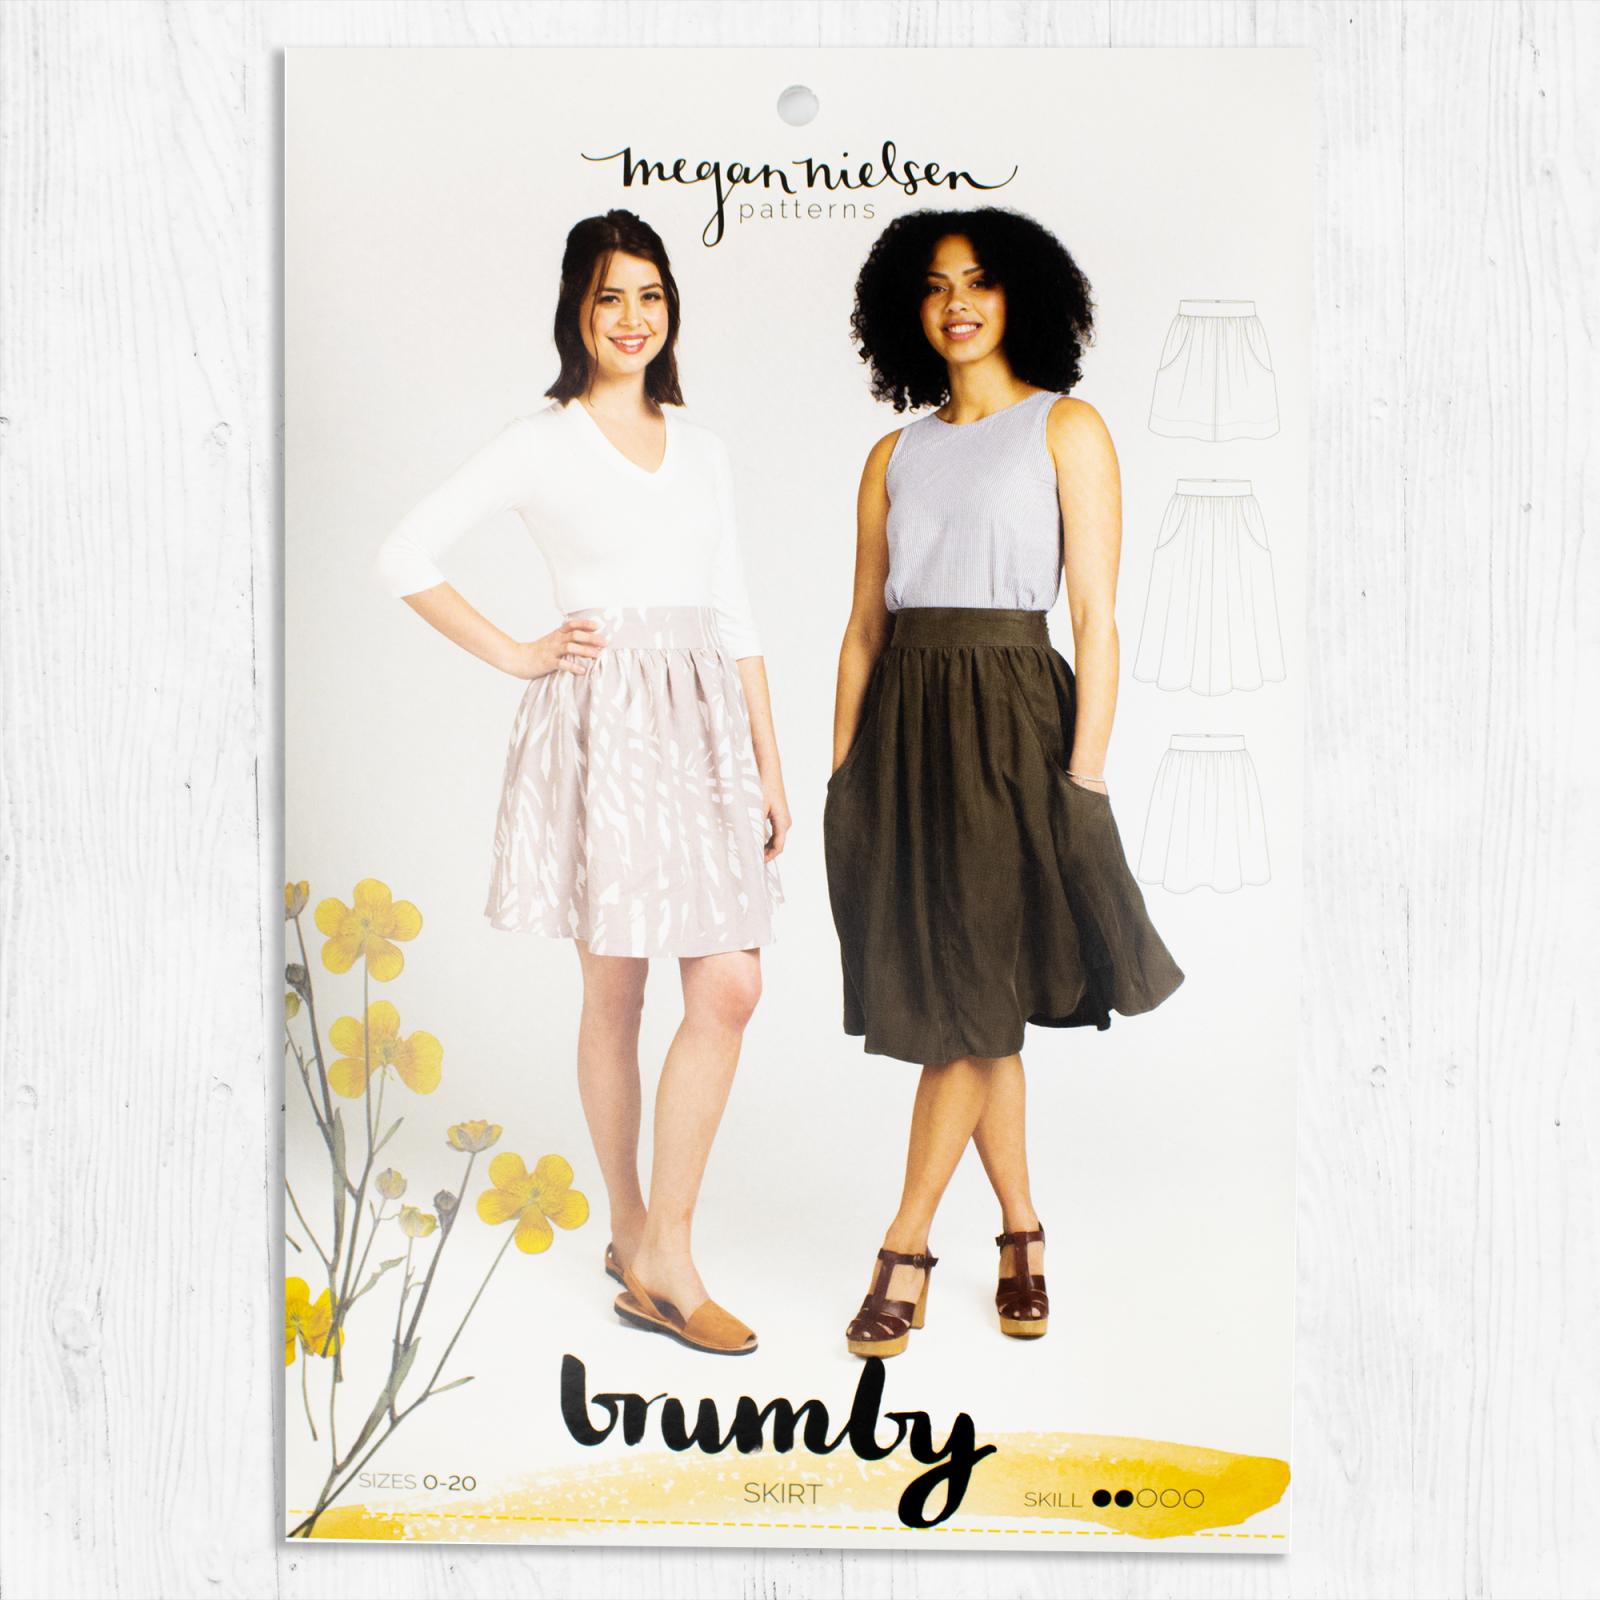 Megan Nielsen Patterns - Brumby Skirt